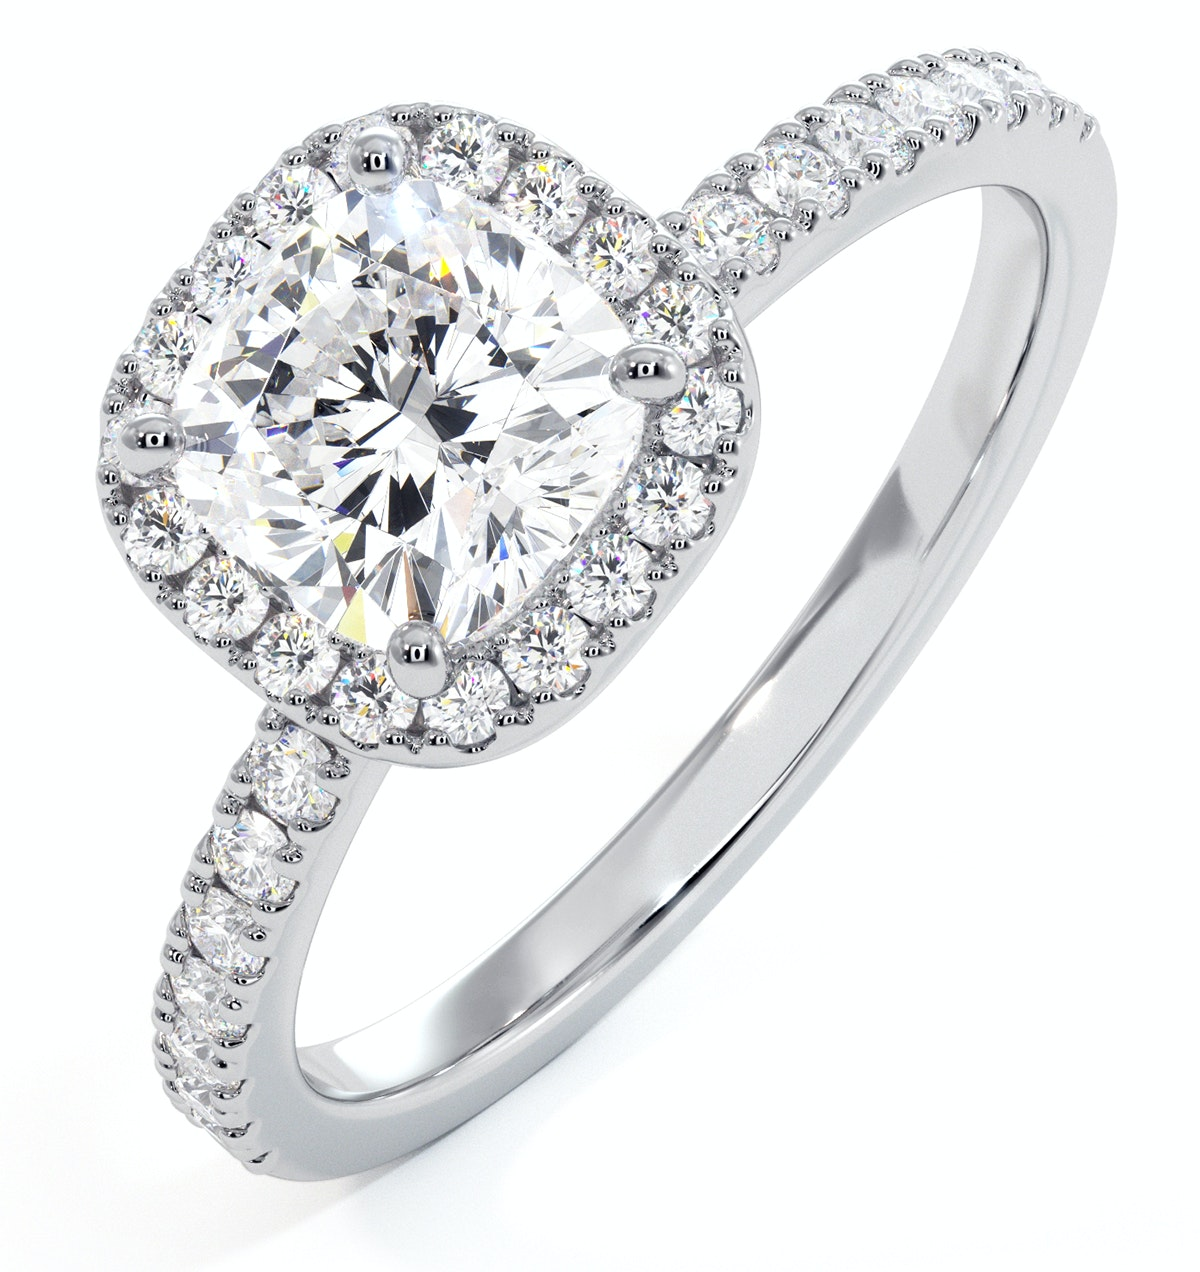 Beatrice GIA Diamond Halo Engagement Ring in Platinum 1.65ct G/VS1